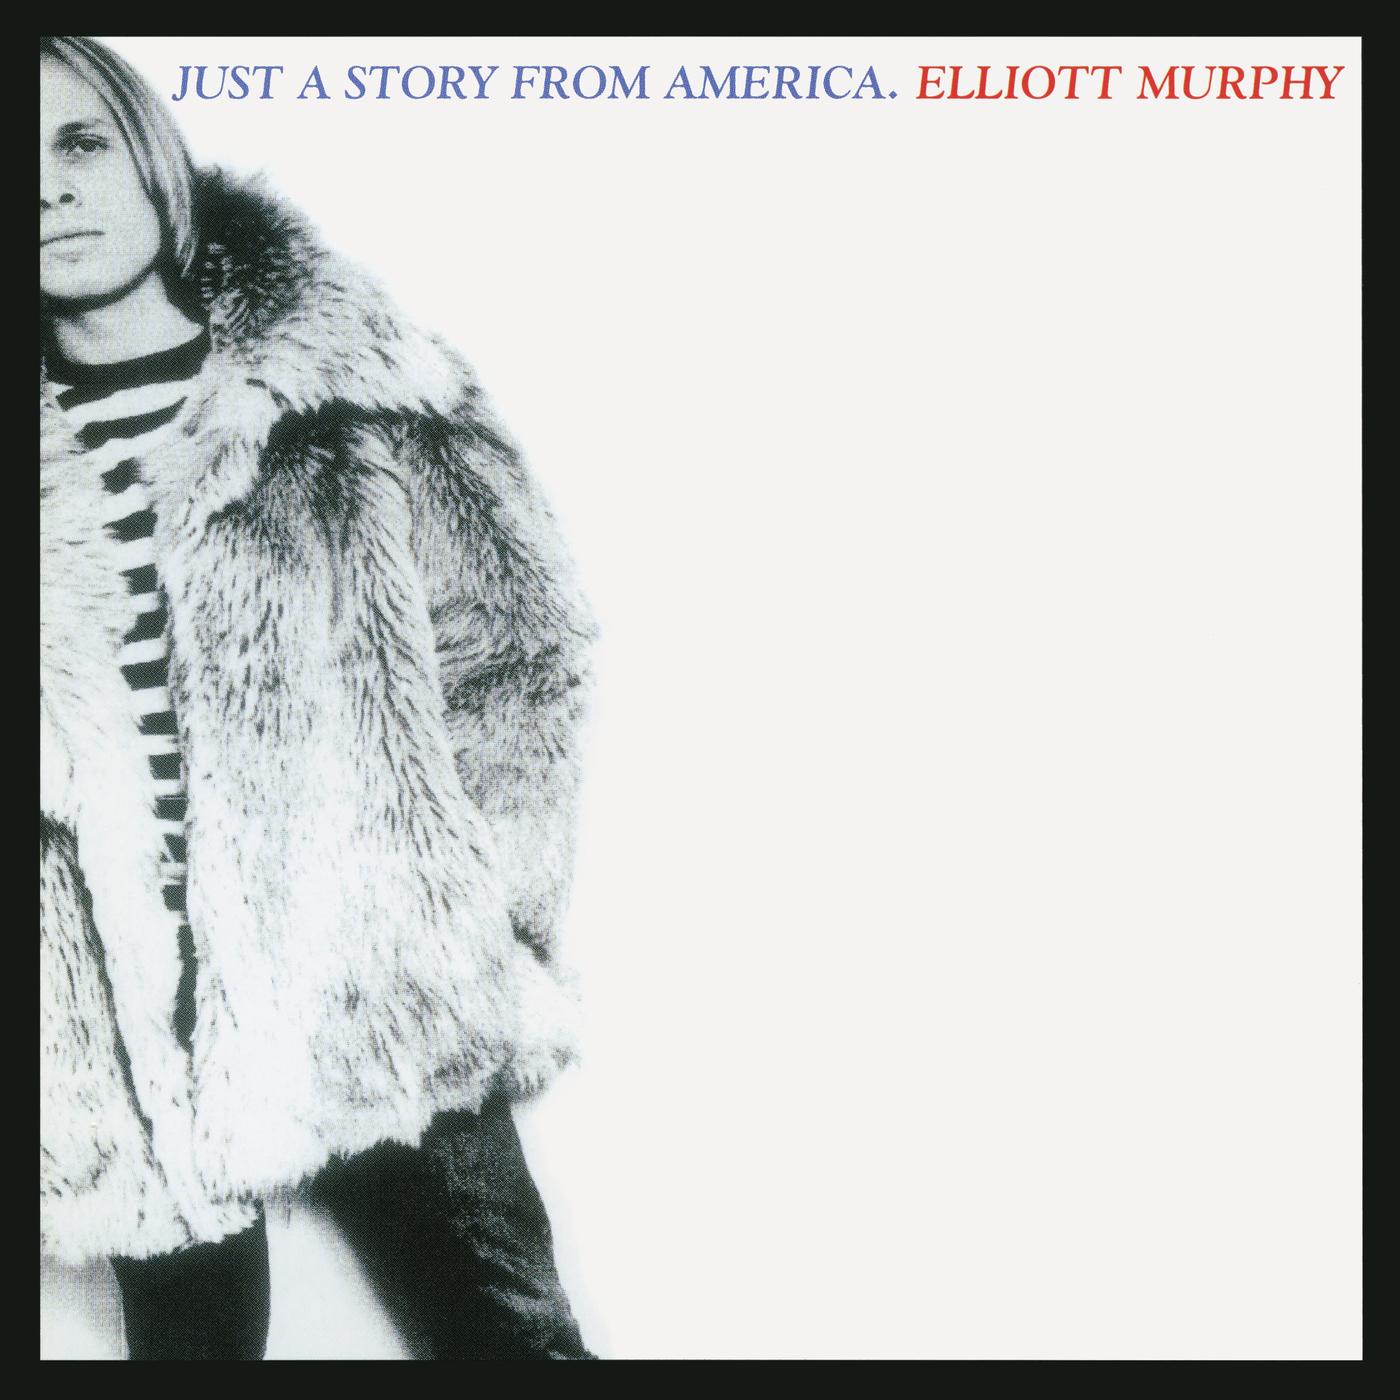 Just a Story from America - Elliott Murphy